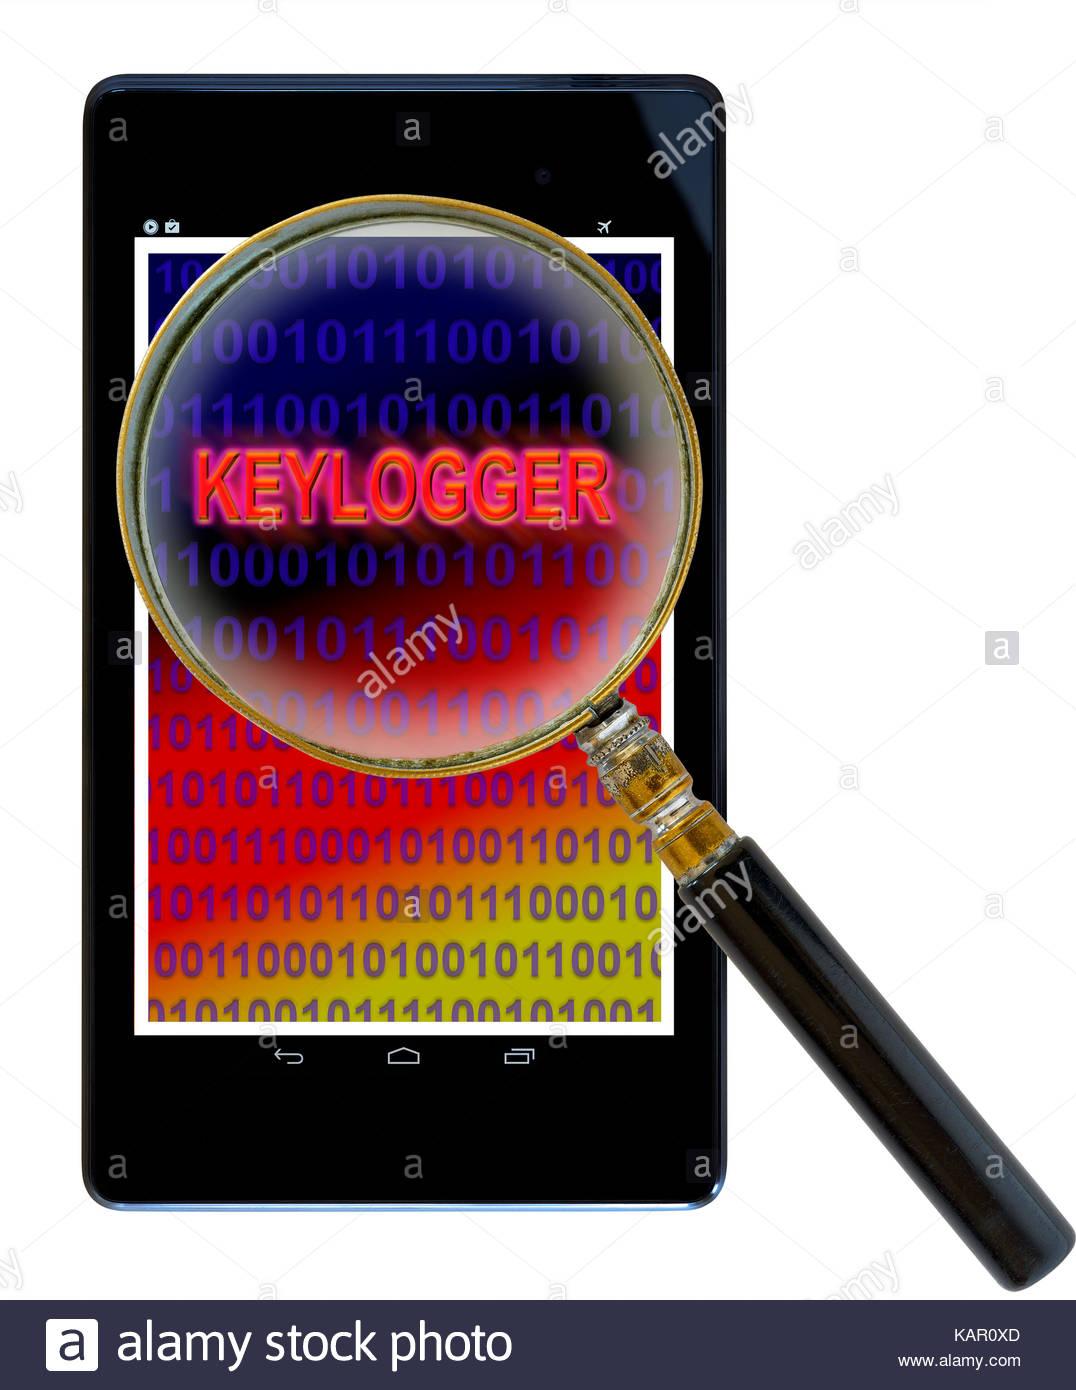 Keylogger shown on a tablet PC, Dorset, England, UK - Stock Image